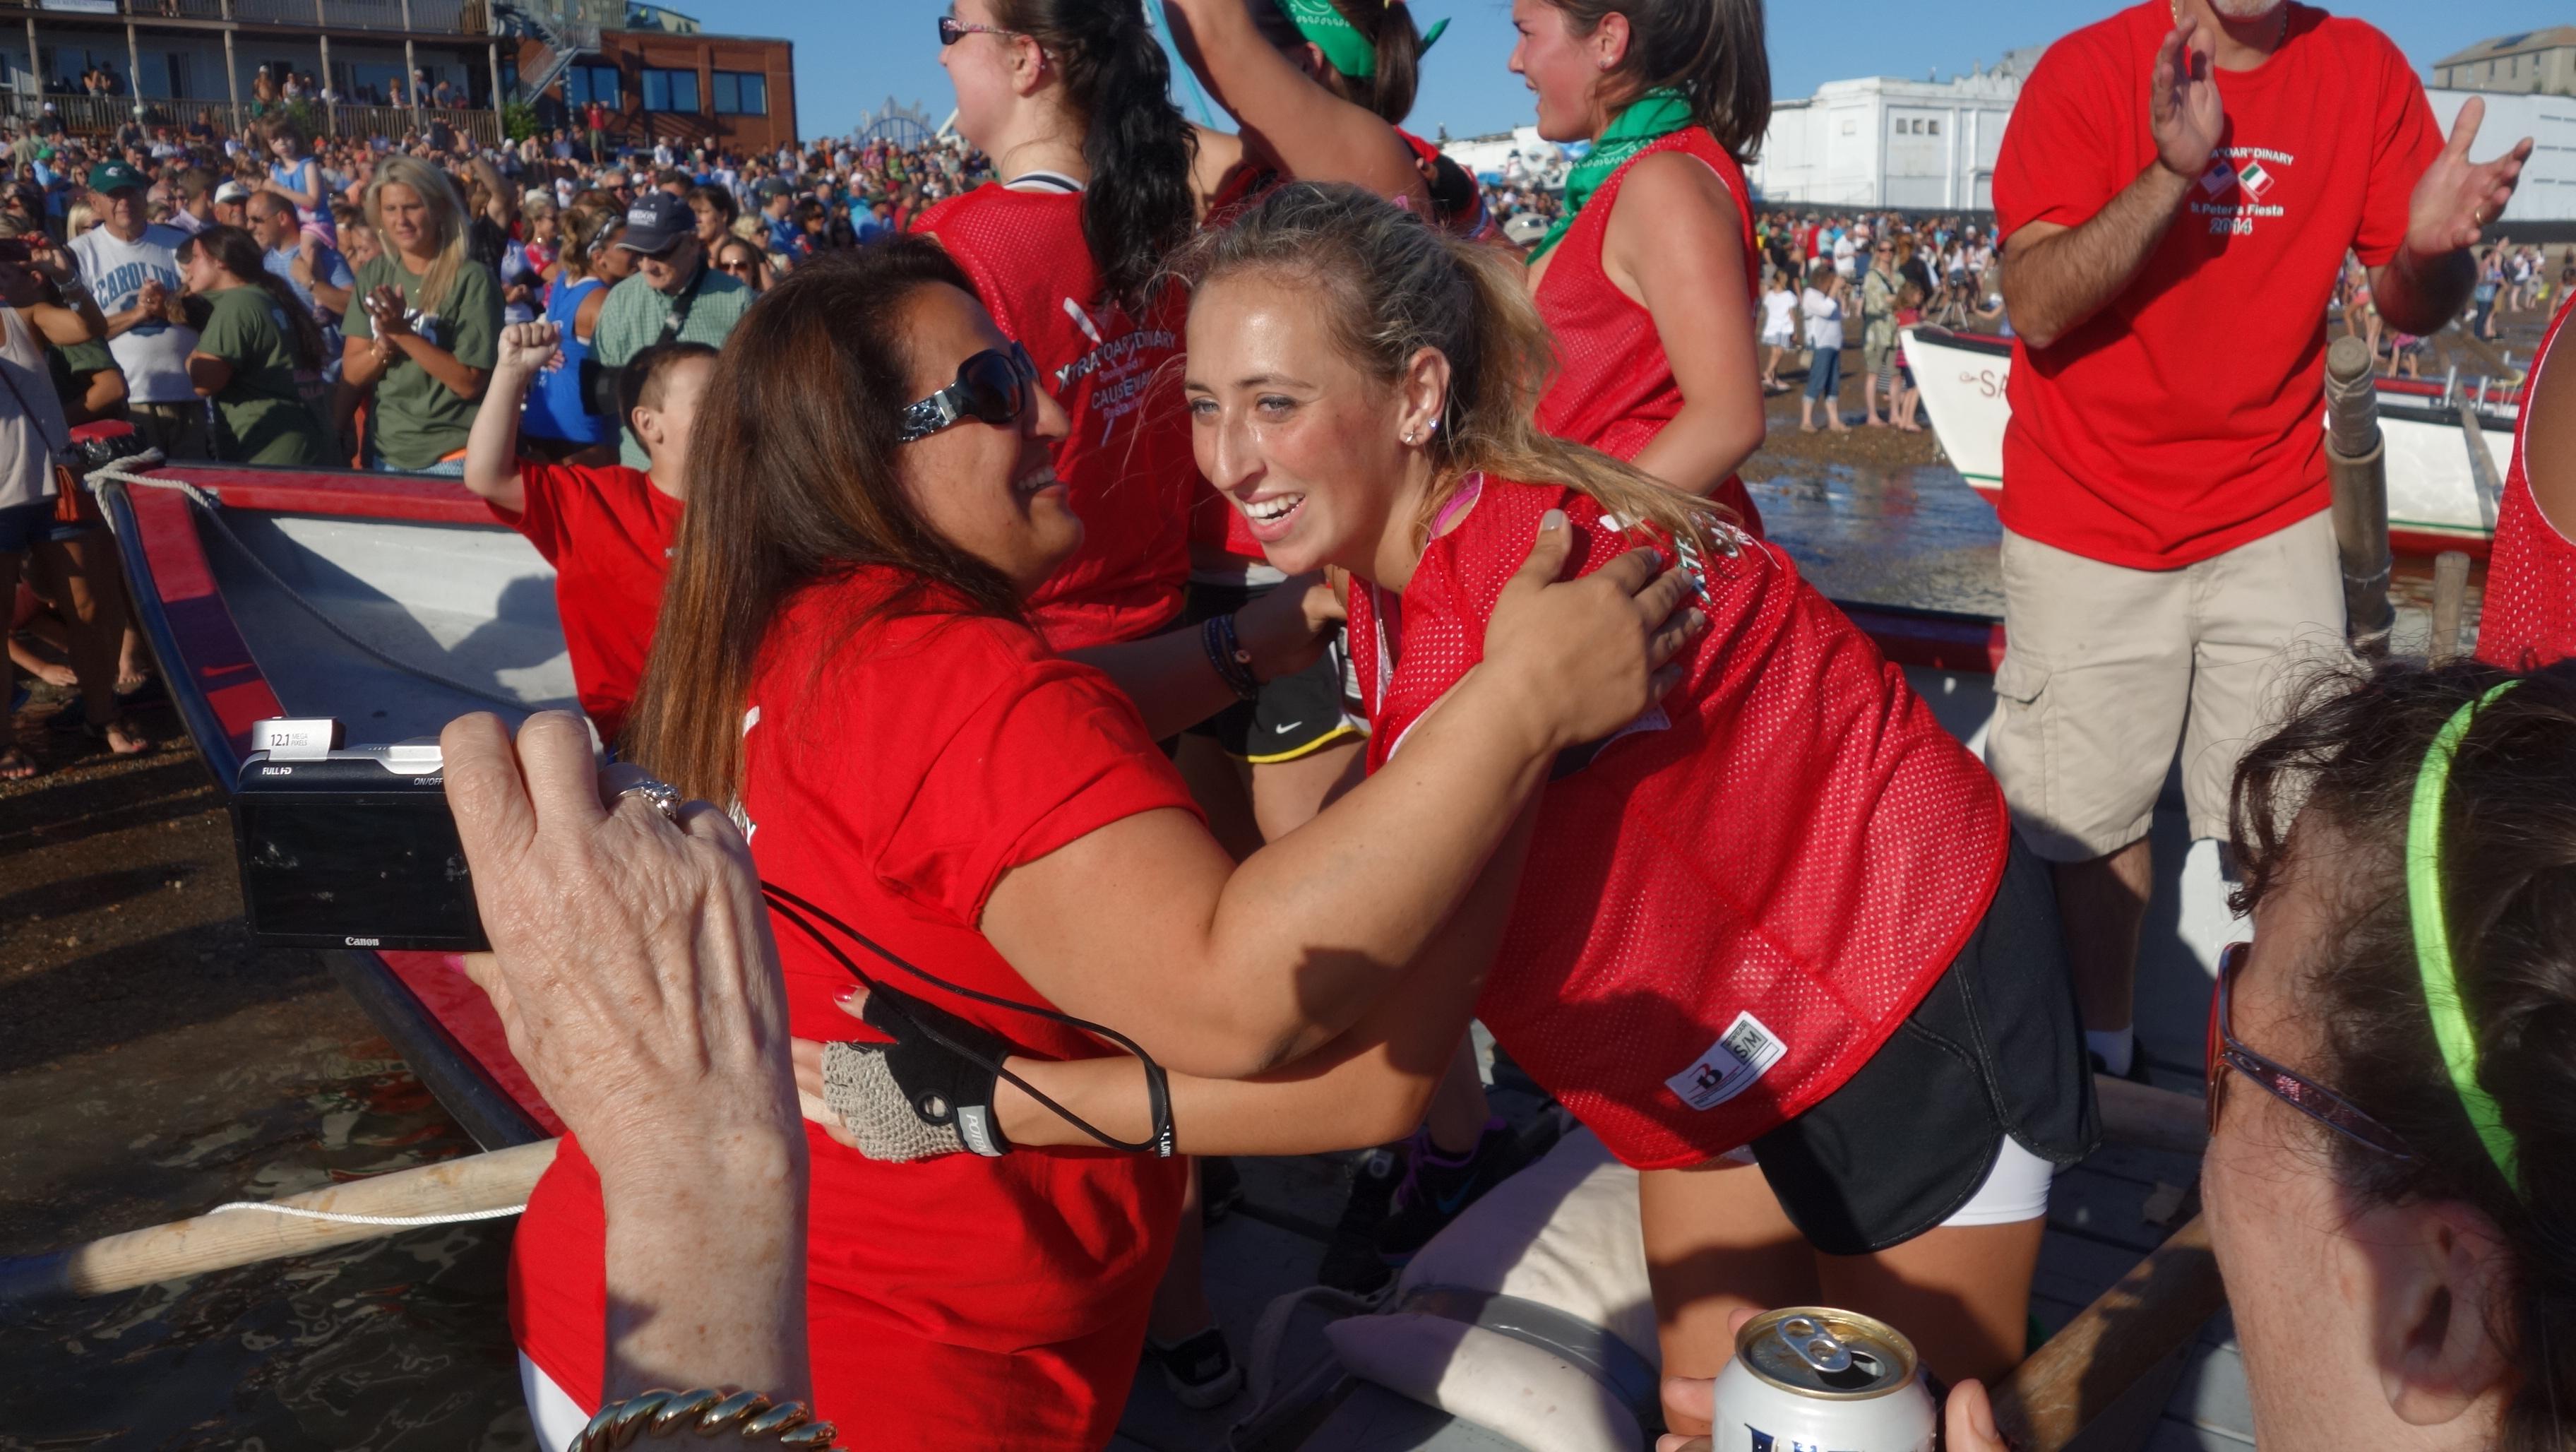 Amanda Race St. Peter's Fiesta 2014 Camps! 218